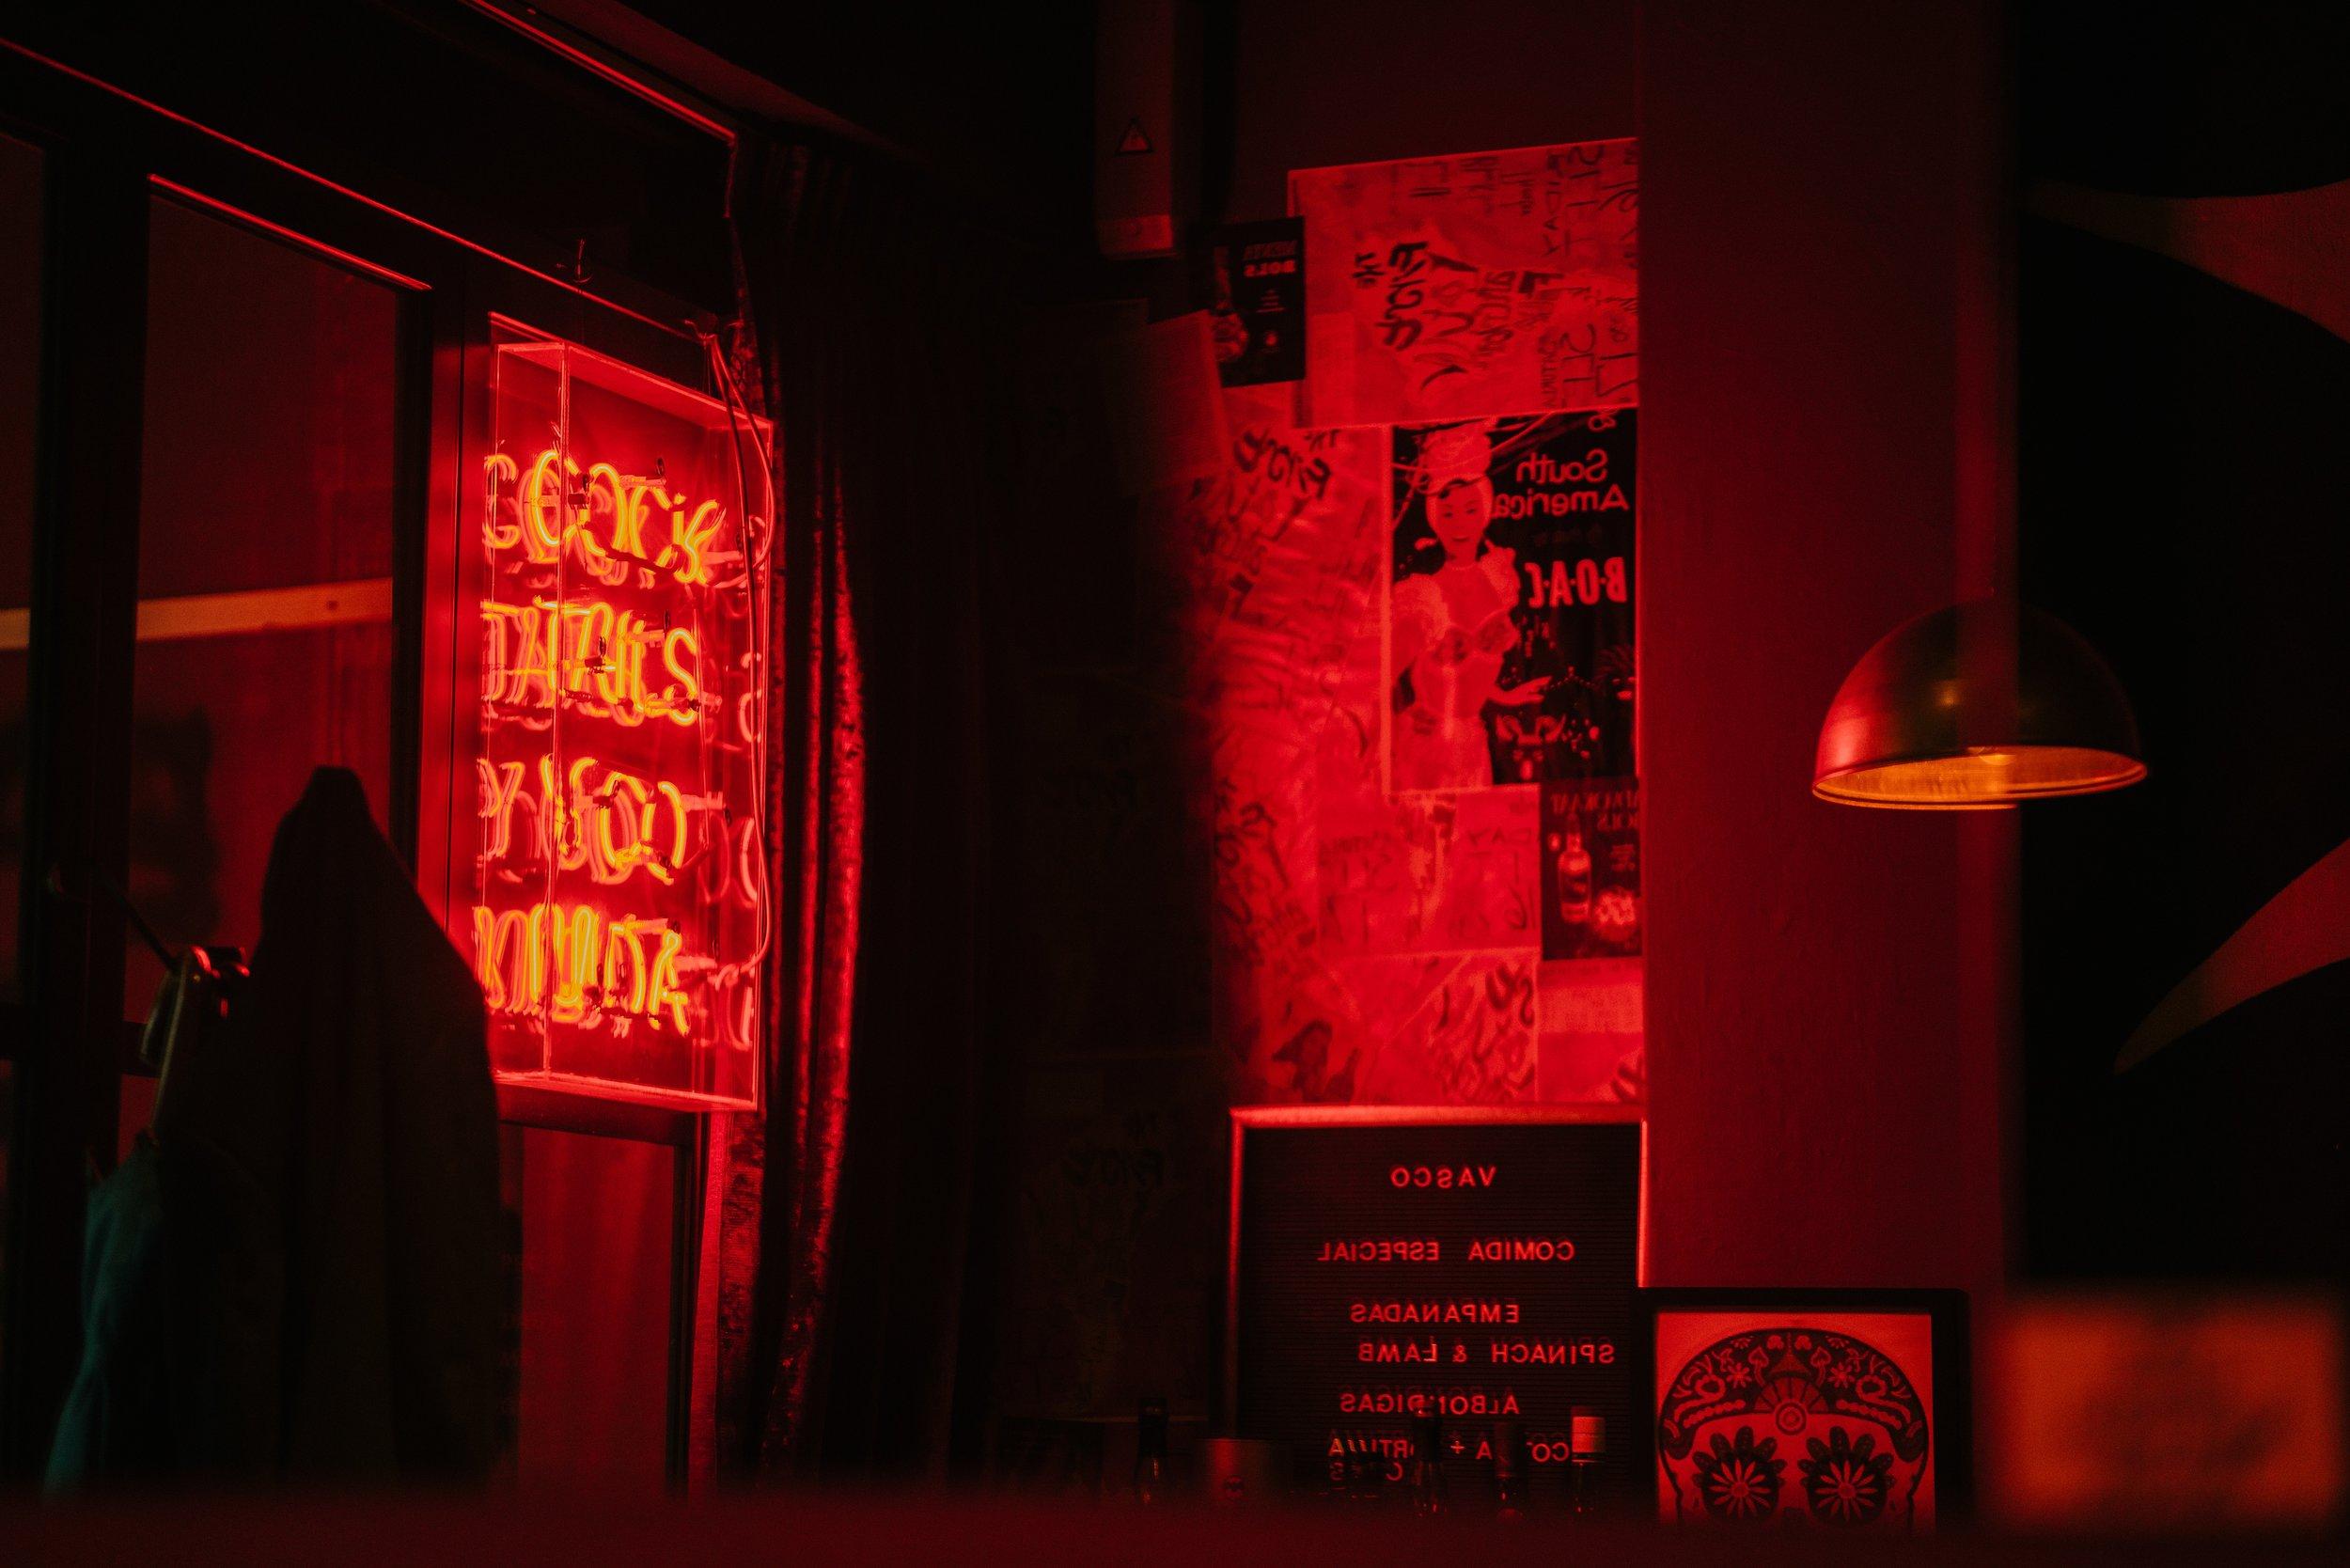 bar-dark-illuminated-1185434.jpg